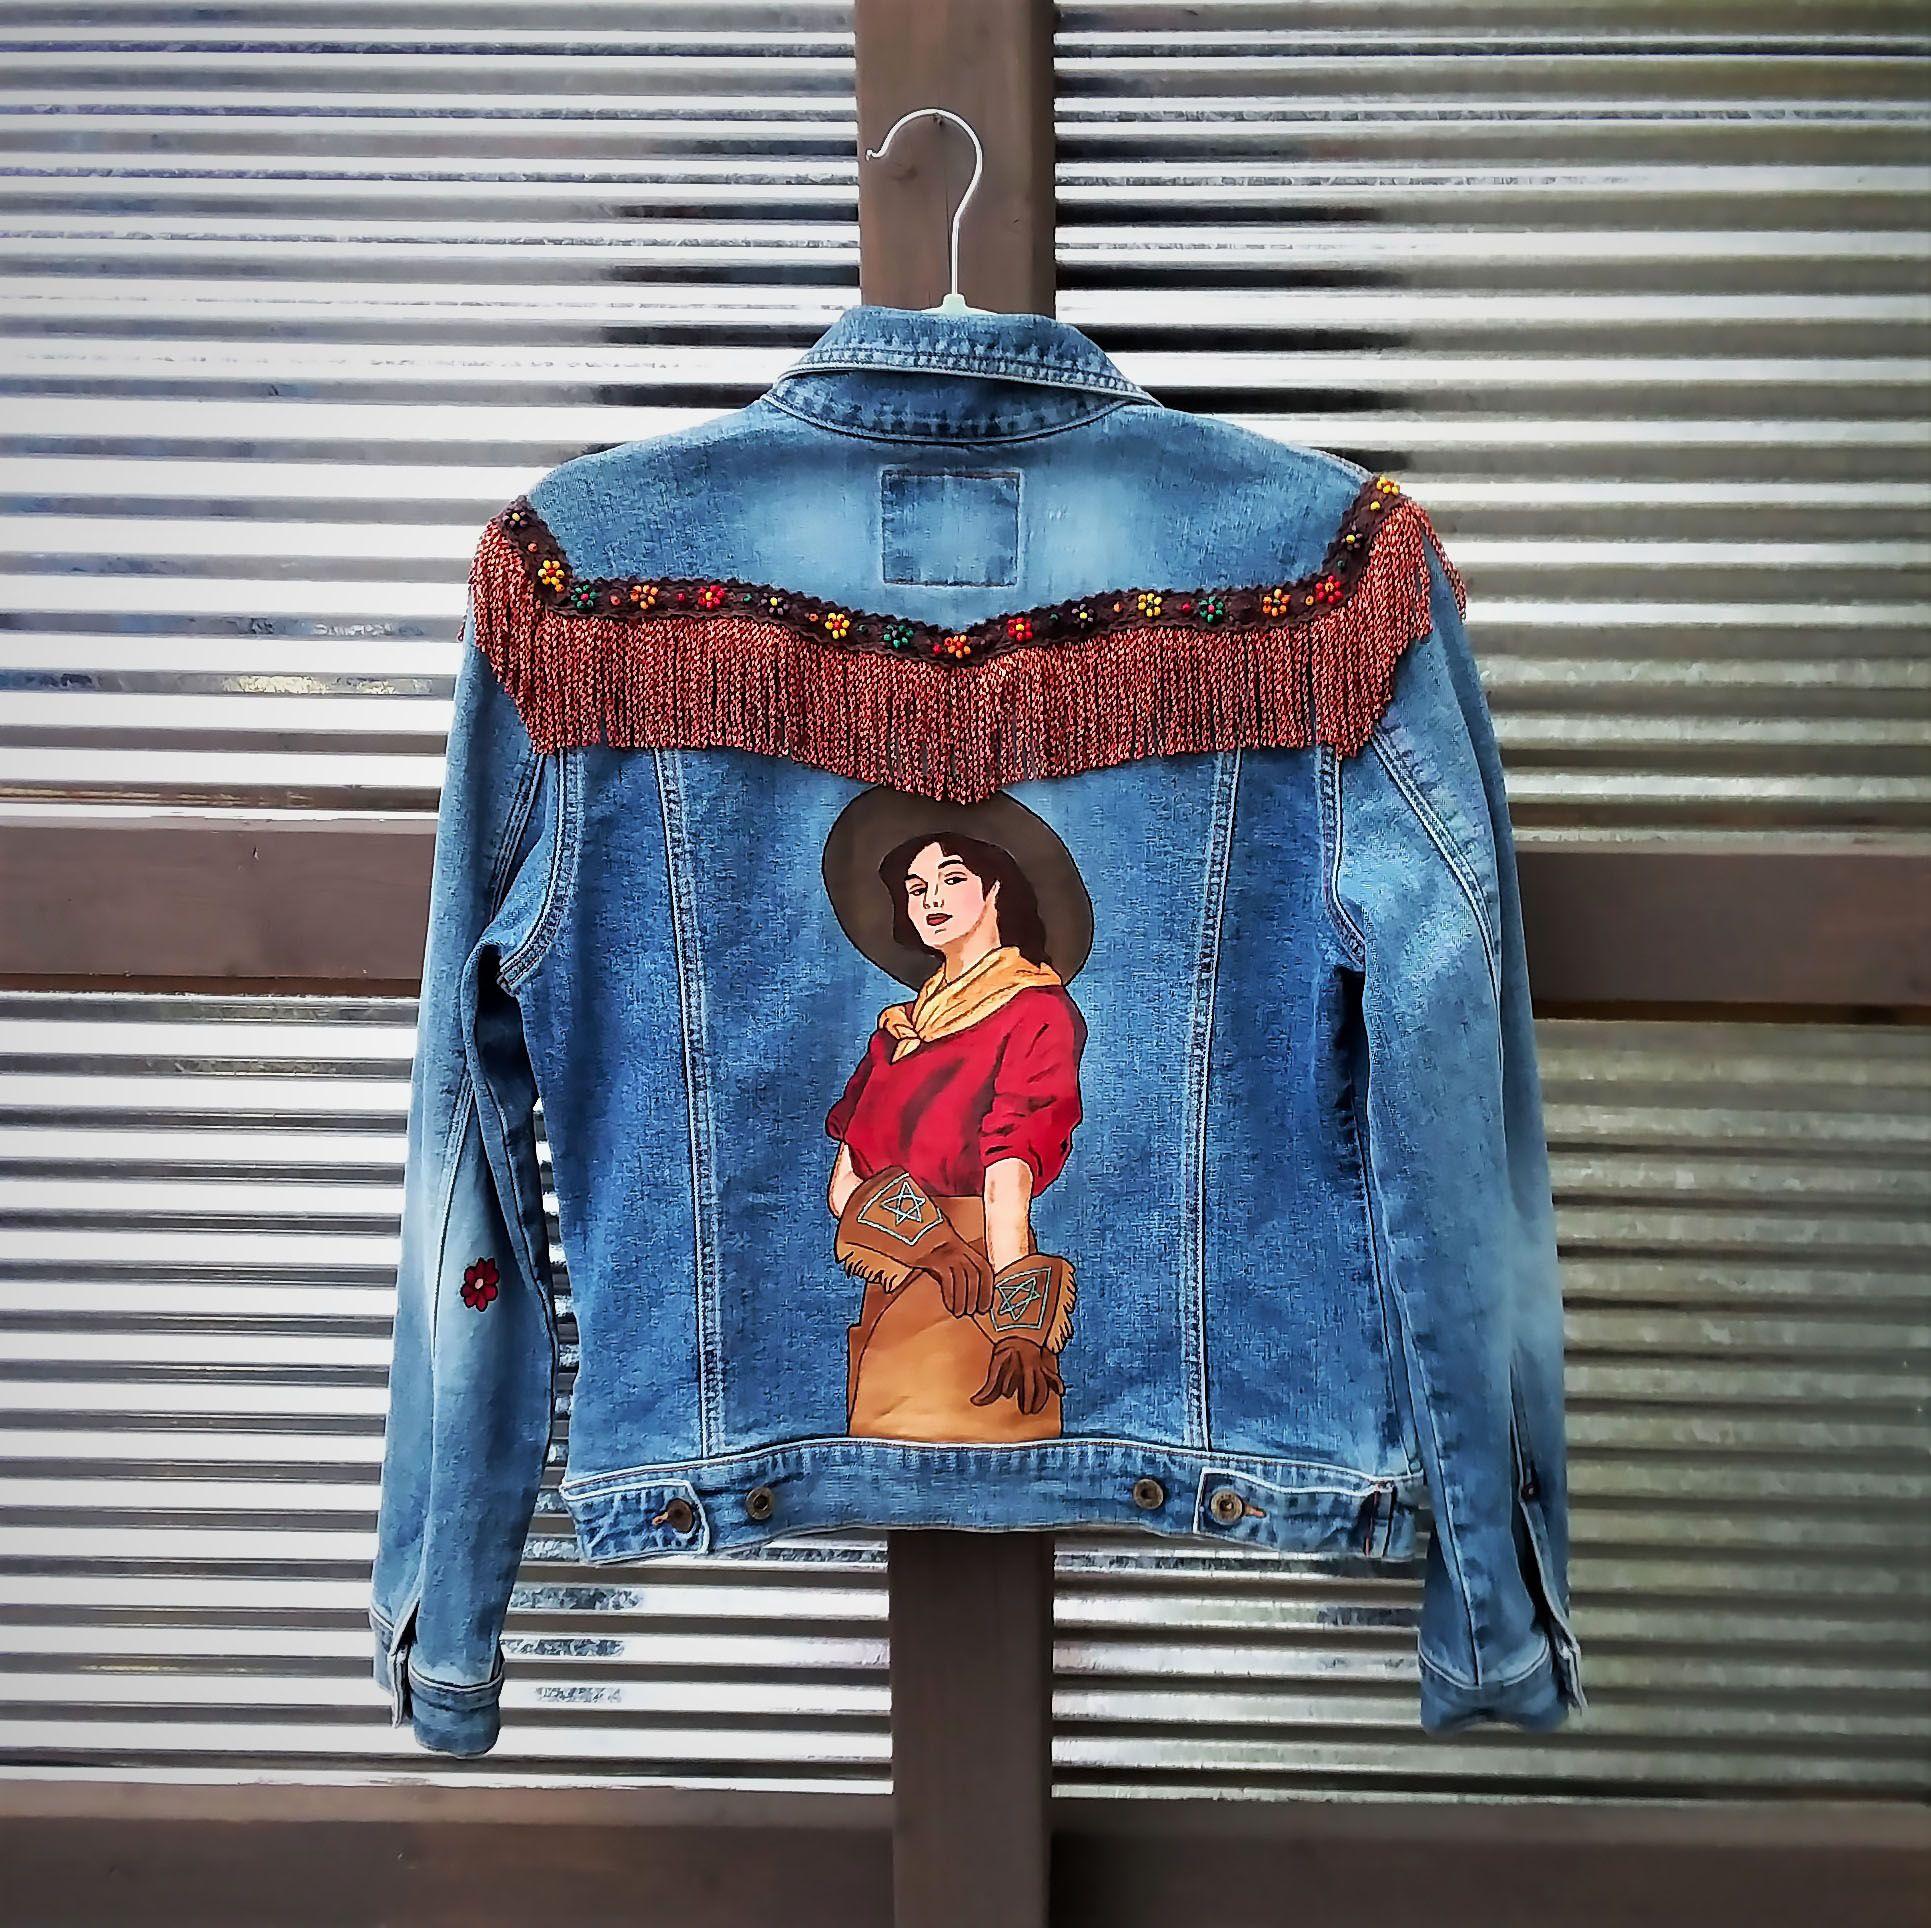 Hand Painted Cowgirl Western Denim Jean Jacket With Fringe By Bleudoor On Instagram Painted Denim Jackets Diy Denim Jacket [ 1928 x 1931 Pixel ]